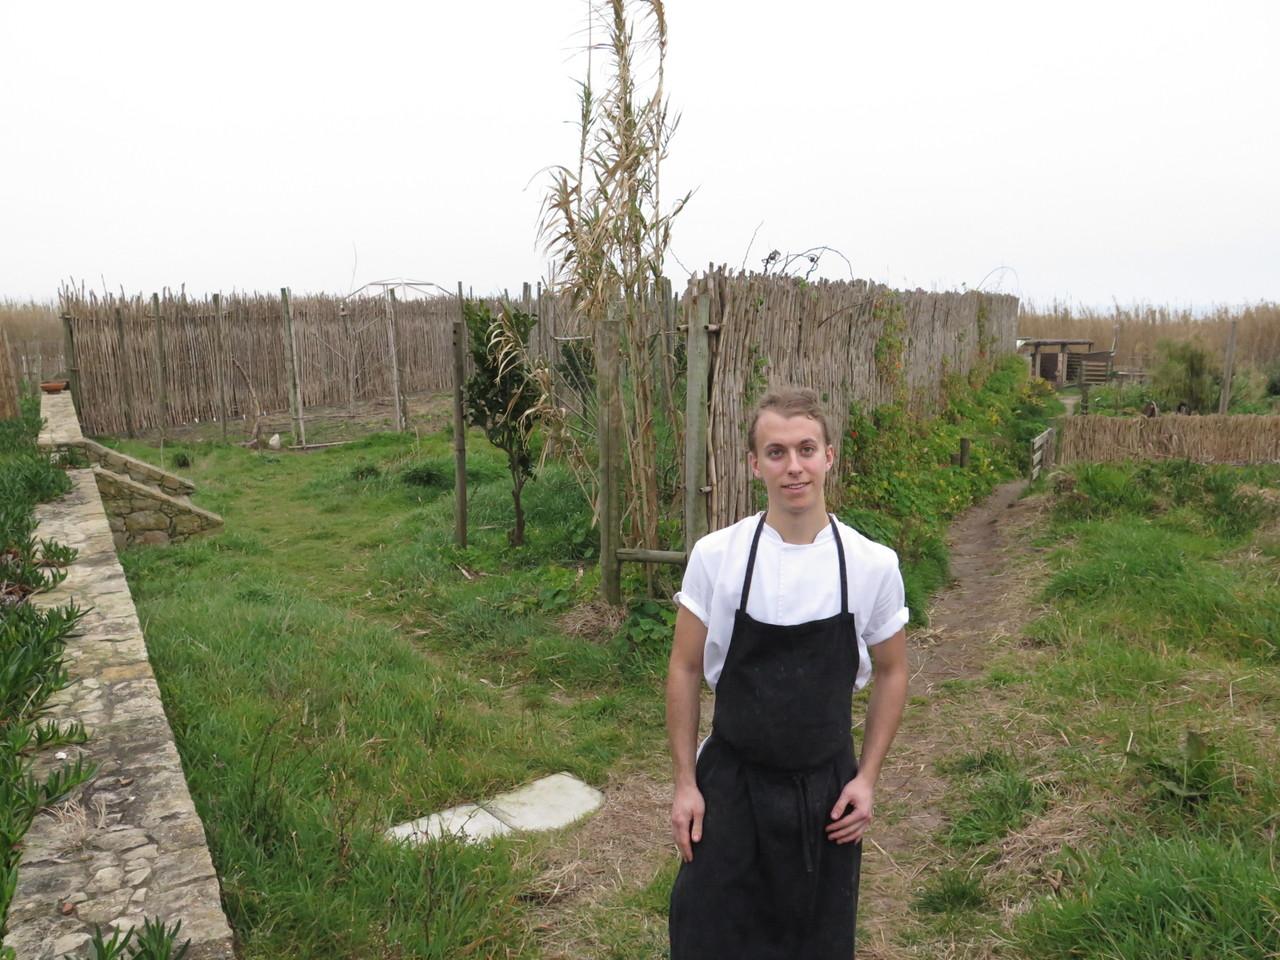 Lukas Ahlberg